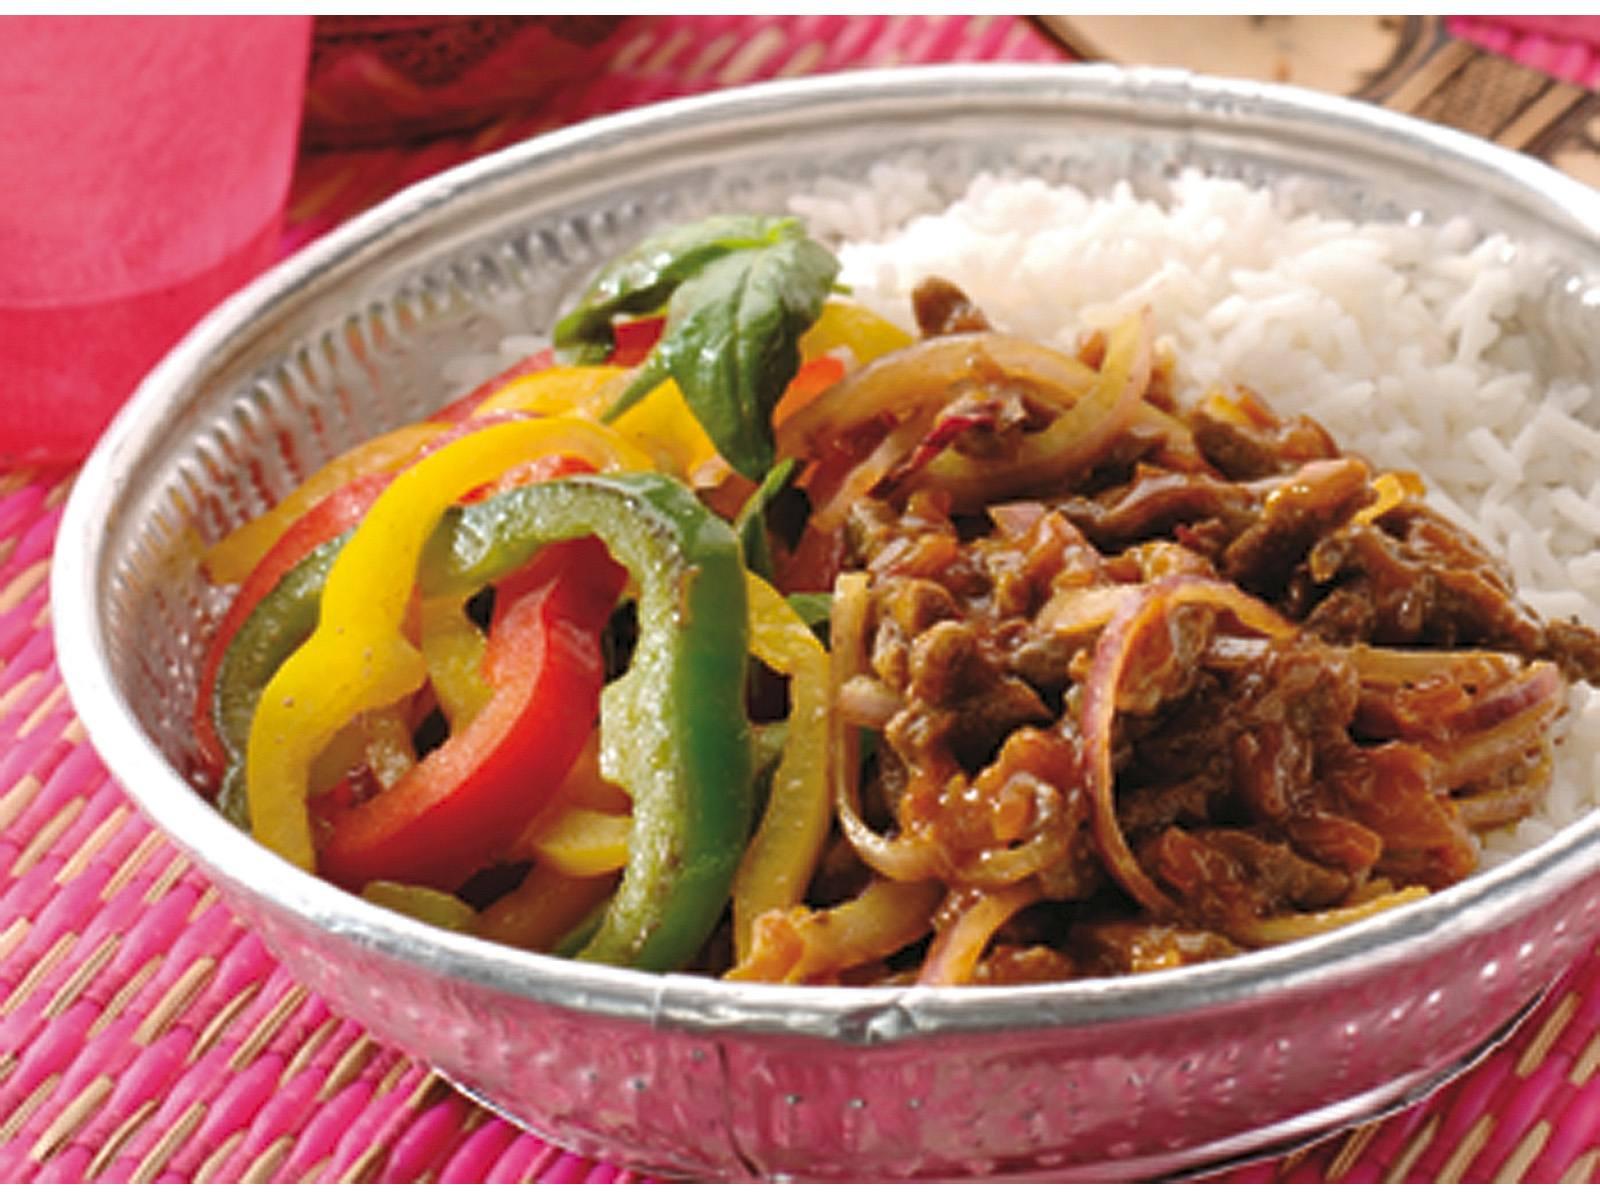 Rendang vlees met gewokte basilicumpaprika en rijst